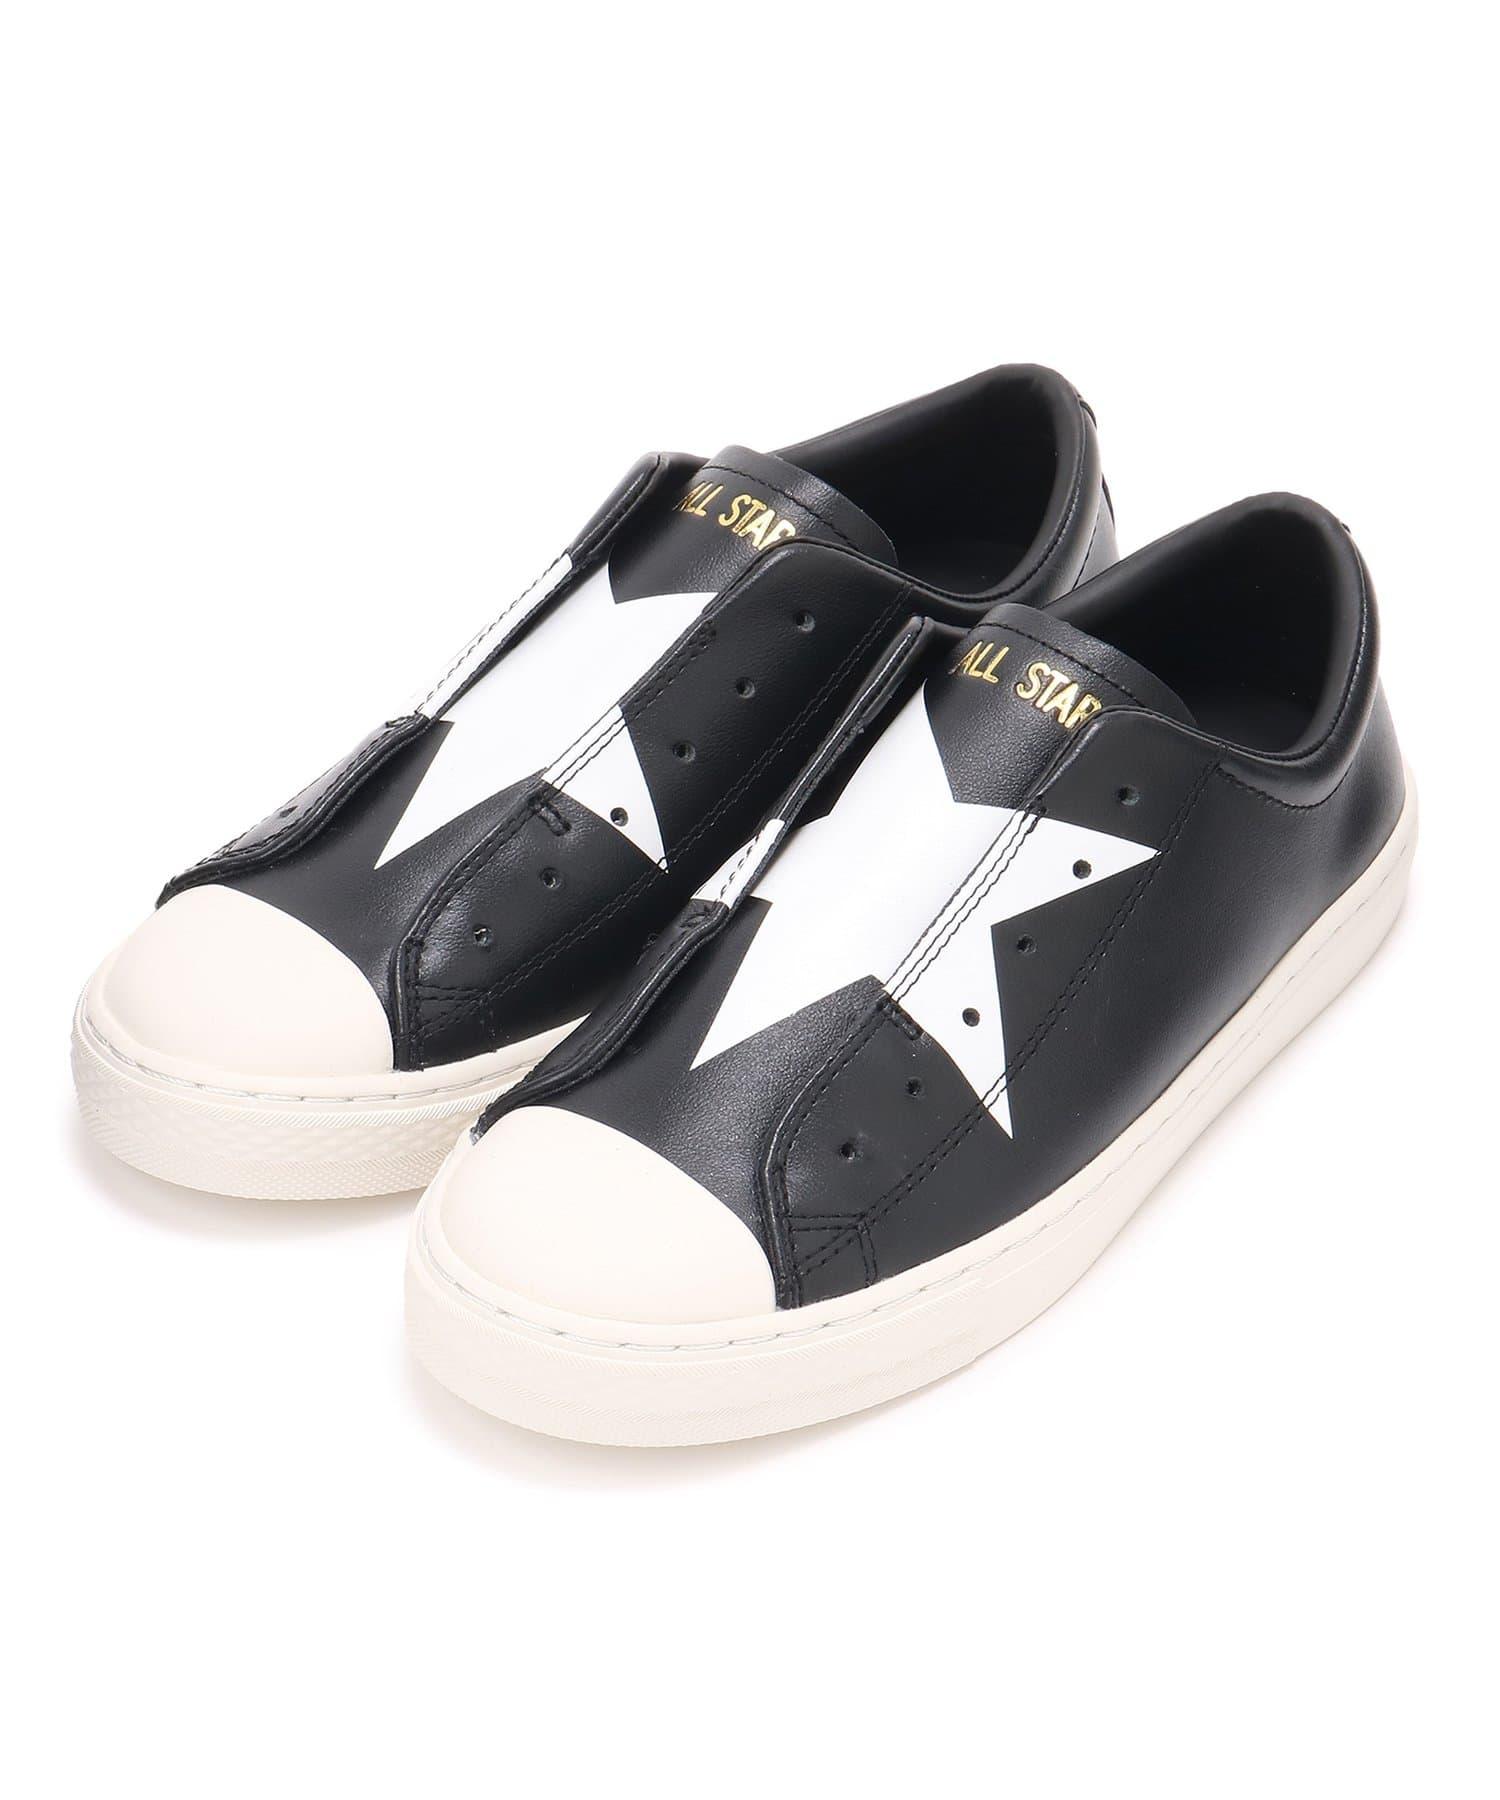 Loungedress(ラウンジドレス) 【CONVERSE】ALL STAR COUPE BS SLIP OX